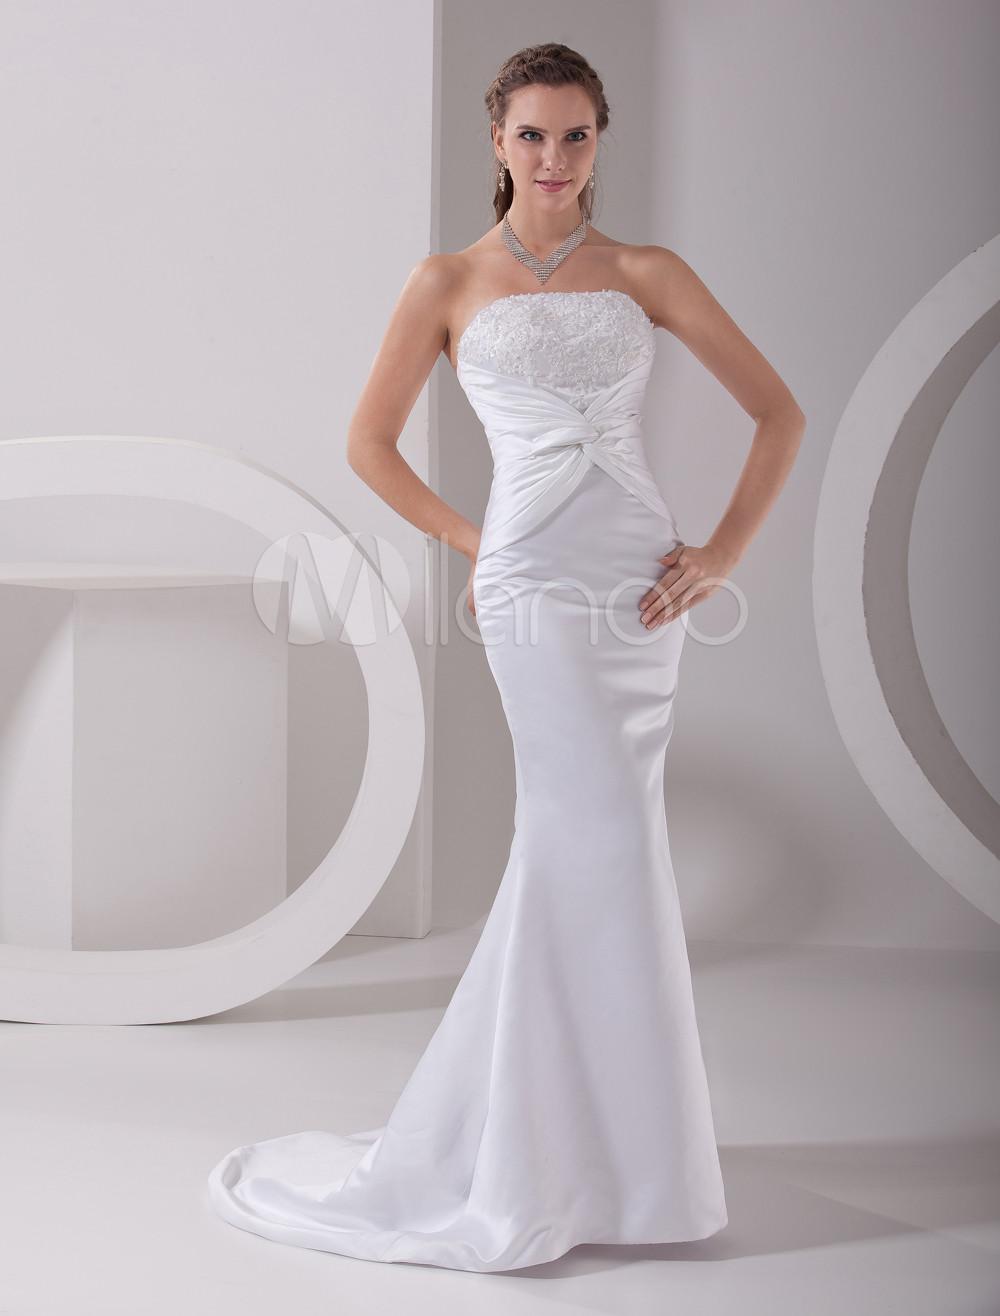 White Wedding Dress Mermaid Strapless Twisted Satin Dress